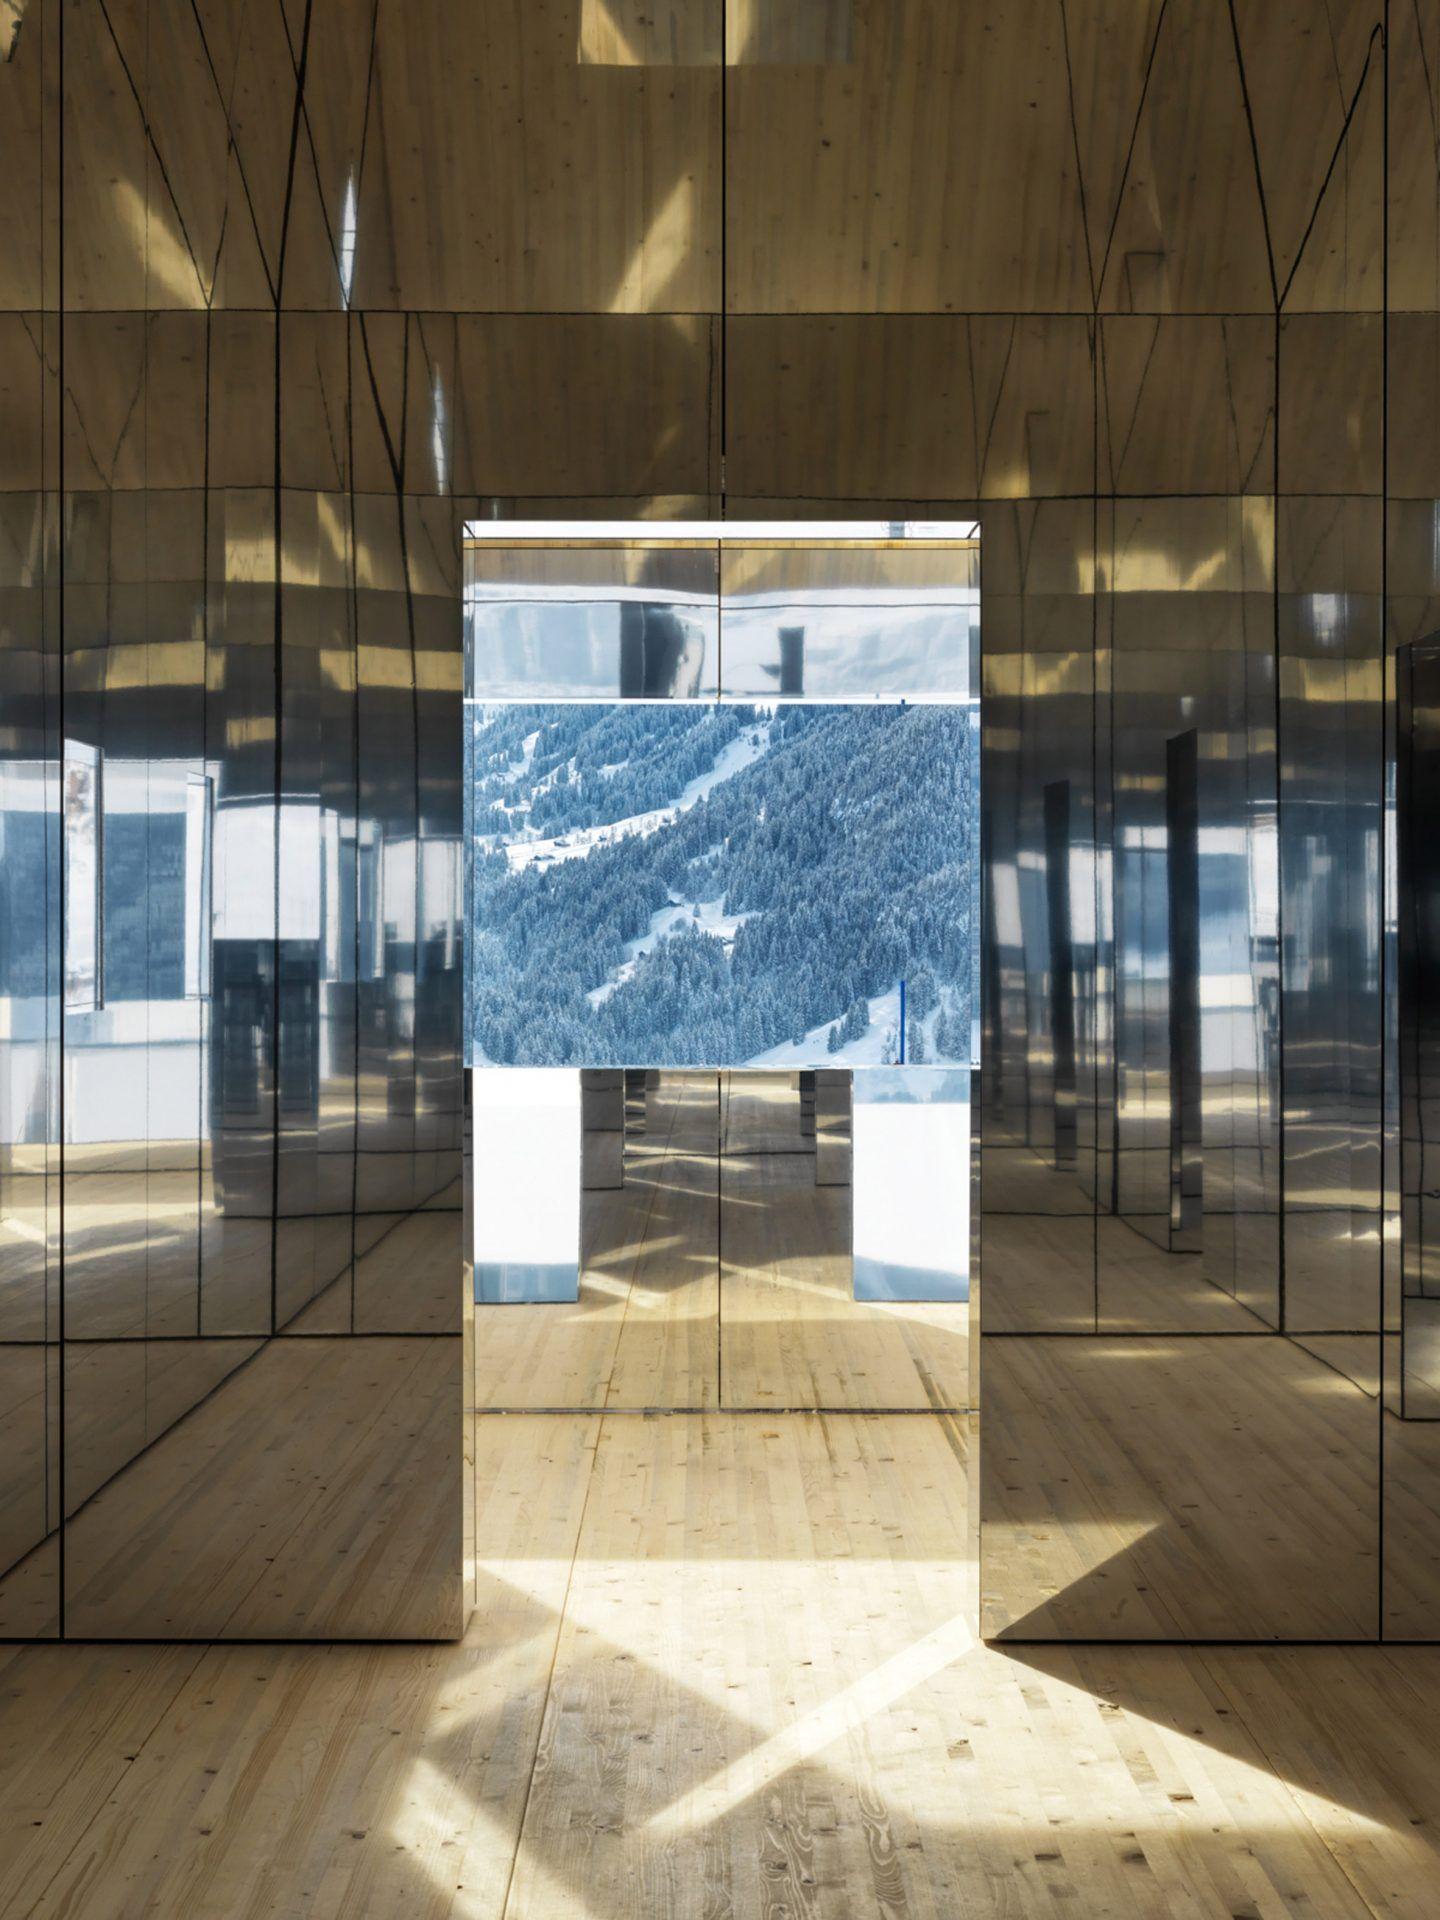 IGNANT-Architecture-Doug-Aitken-Mirage-Gstaad-4